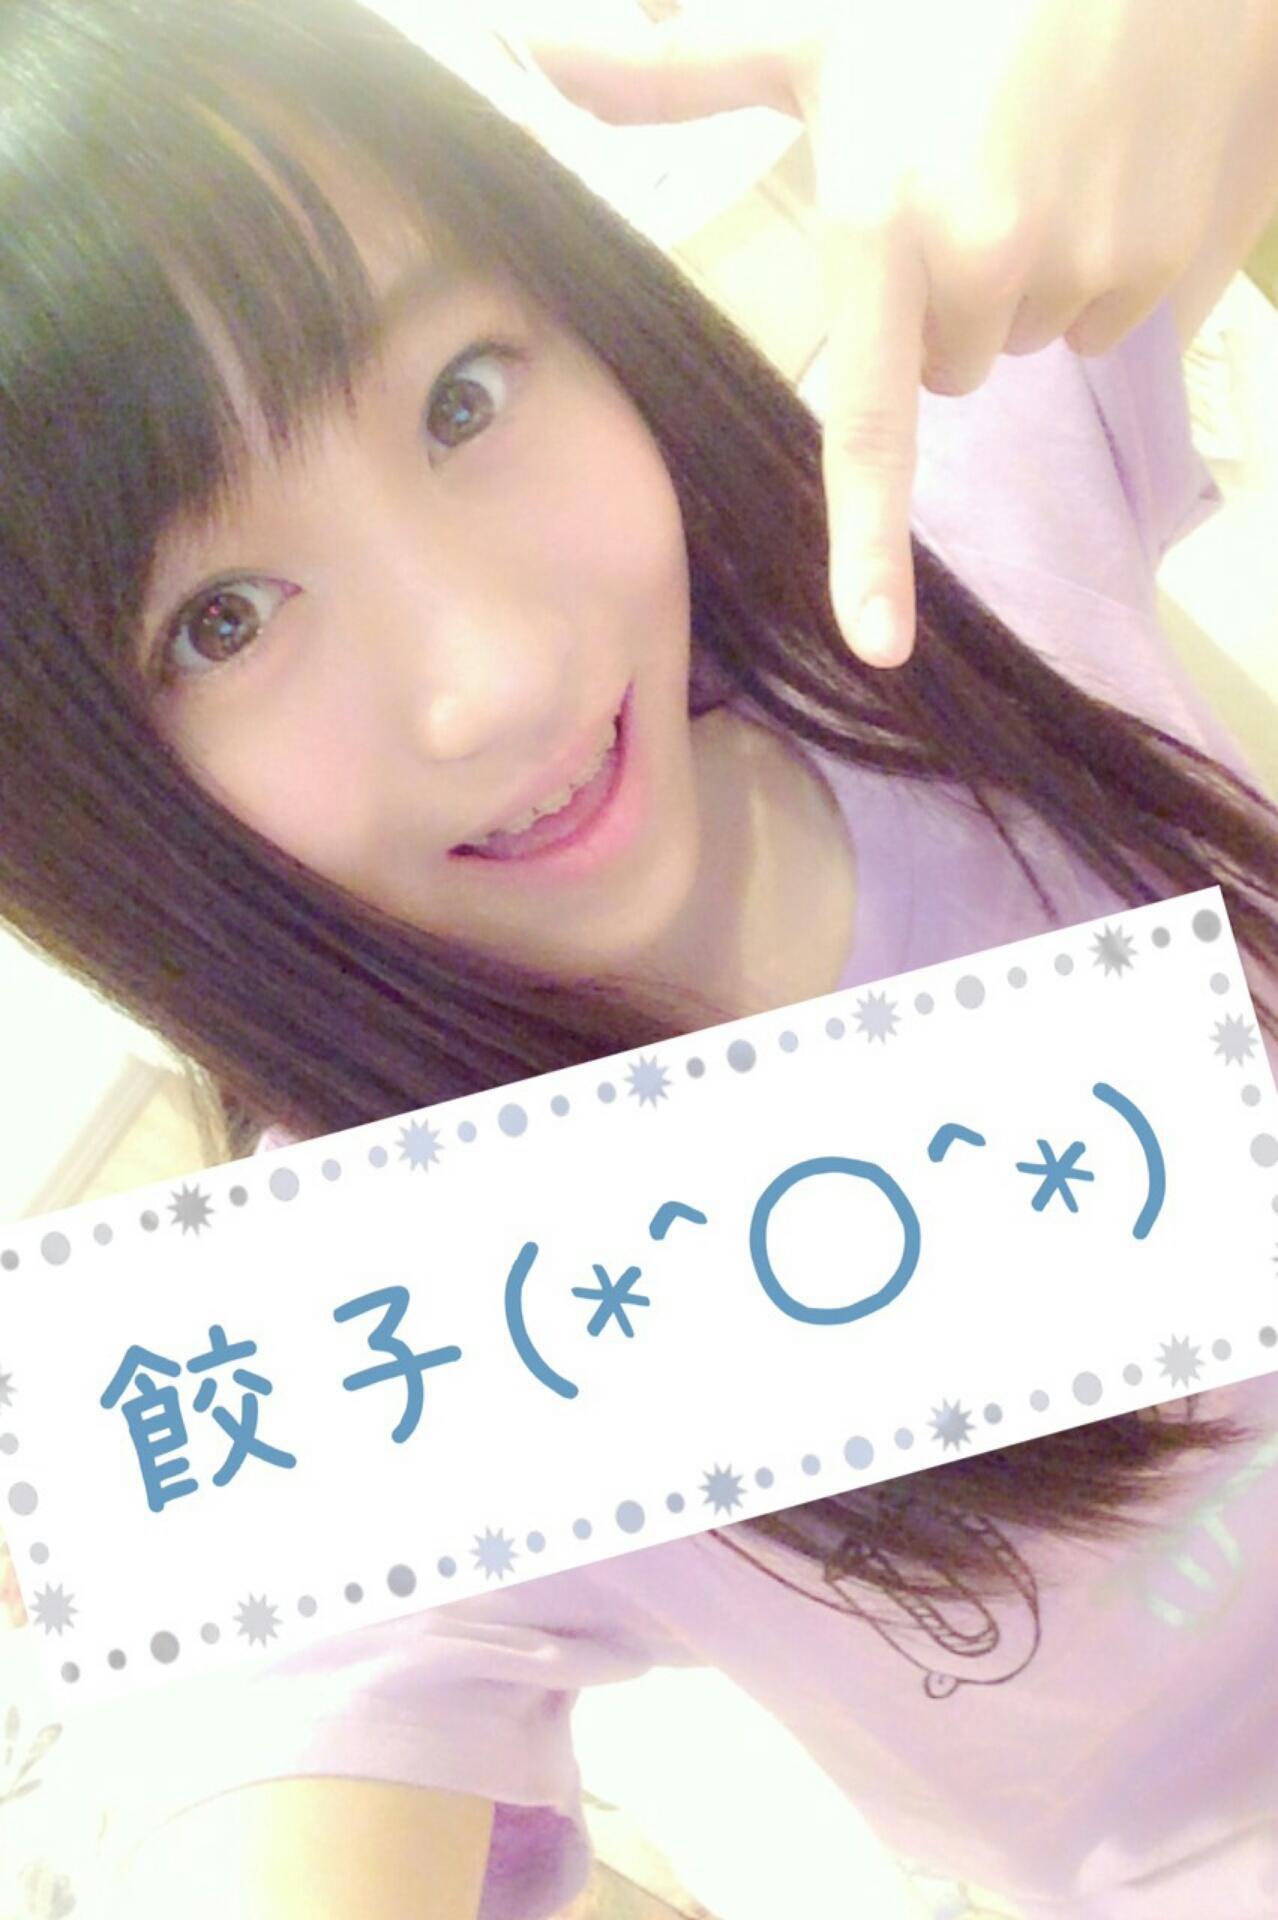 https://i1.wp.com/stat.7gogo.jp/appimg_images/20151120/20/bb/JZ/j/o12781920p.jpg